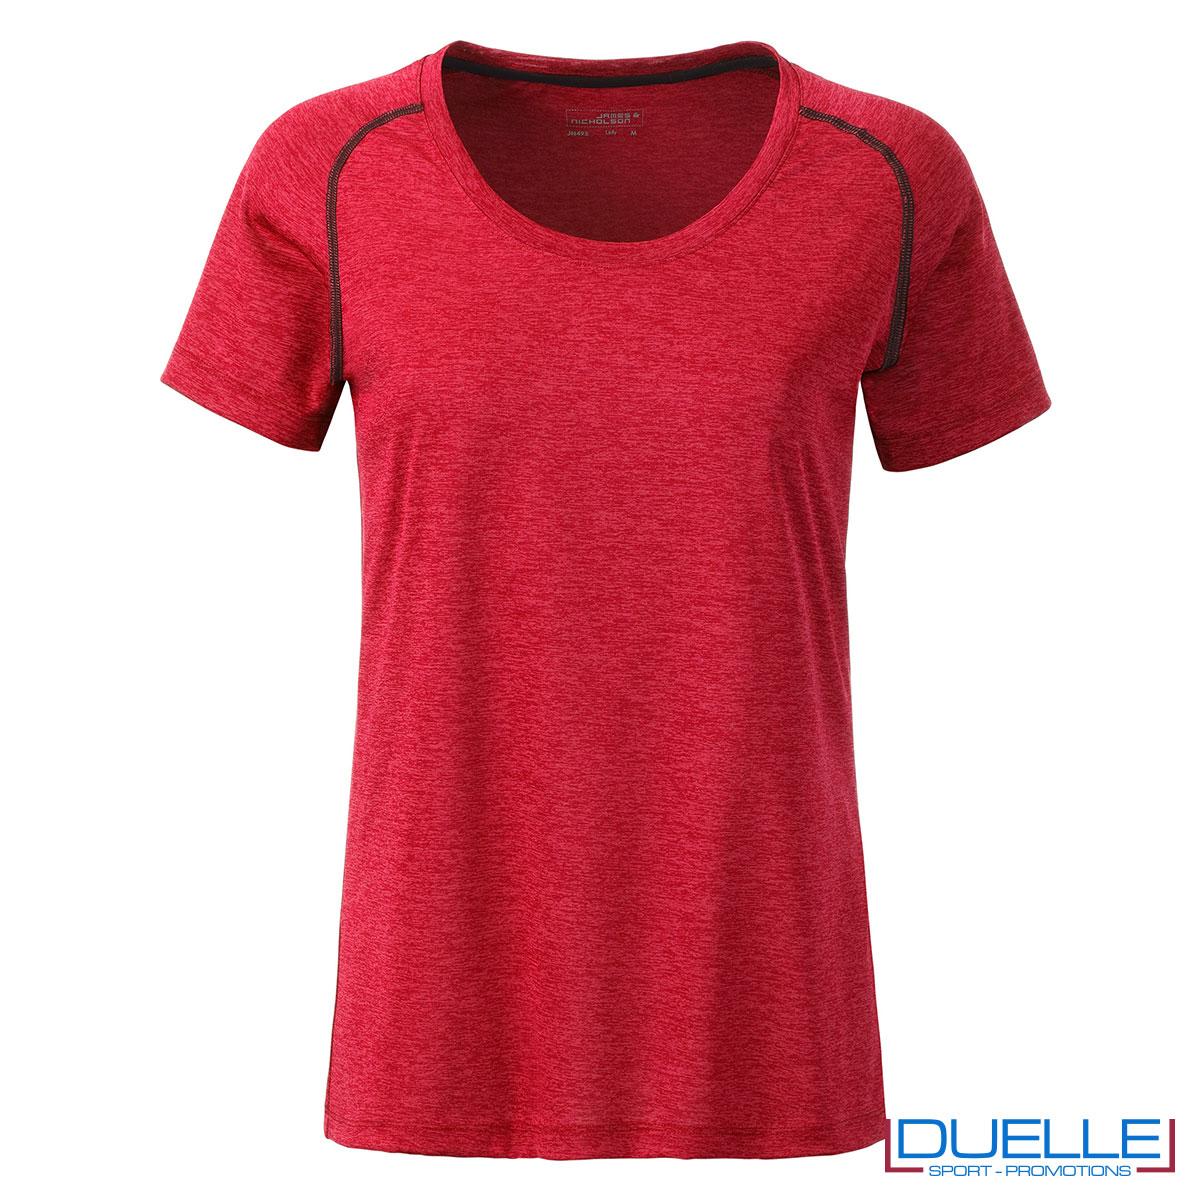 maglia rosso melange per fitness femminile